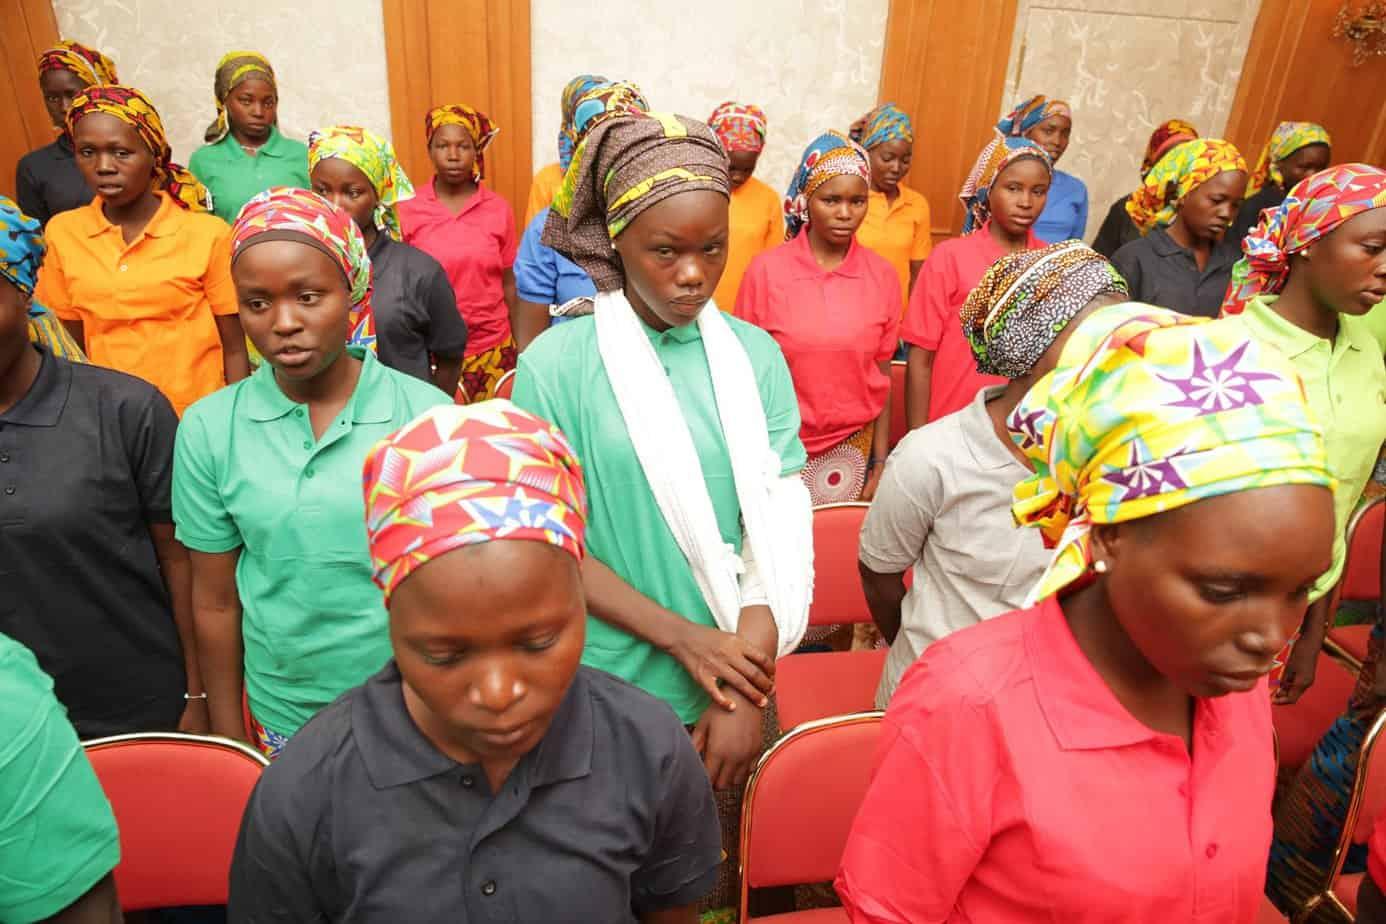 Twenty-four Chibok girls to return to school: Nigerian officials